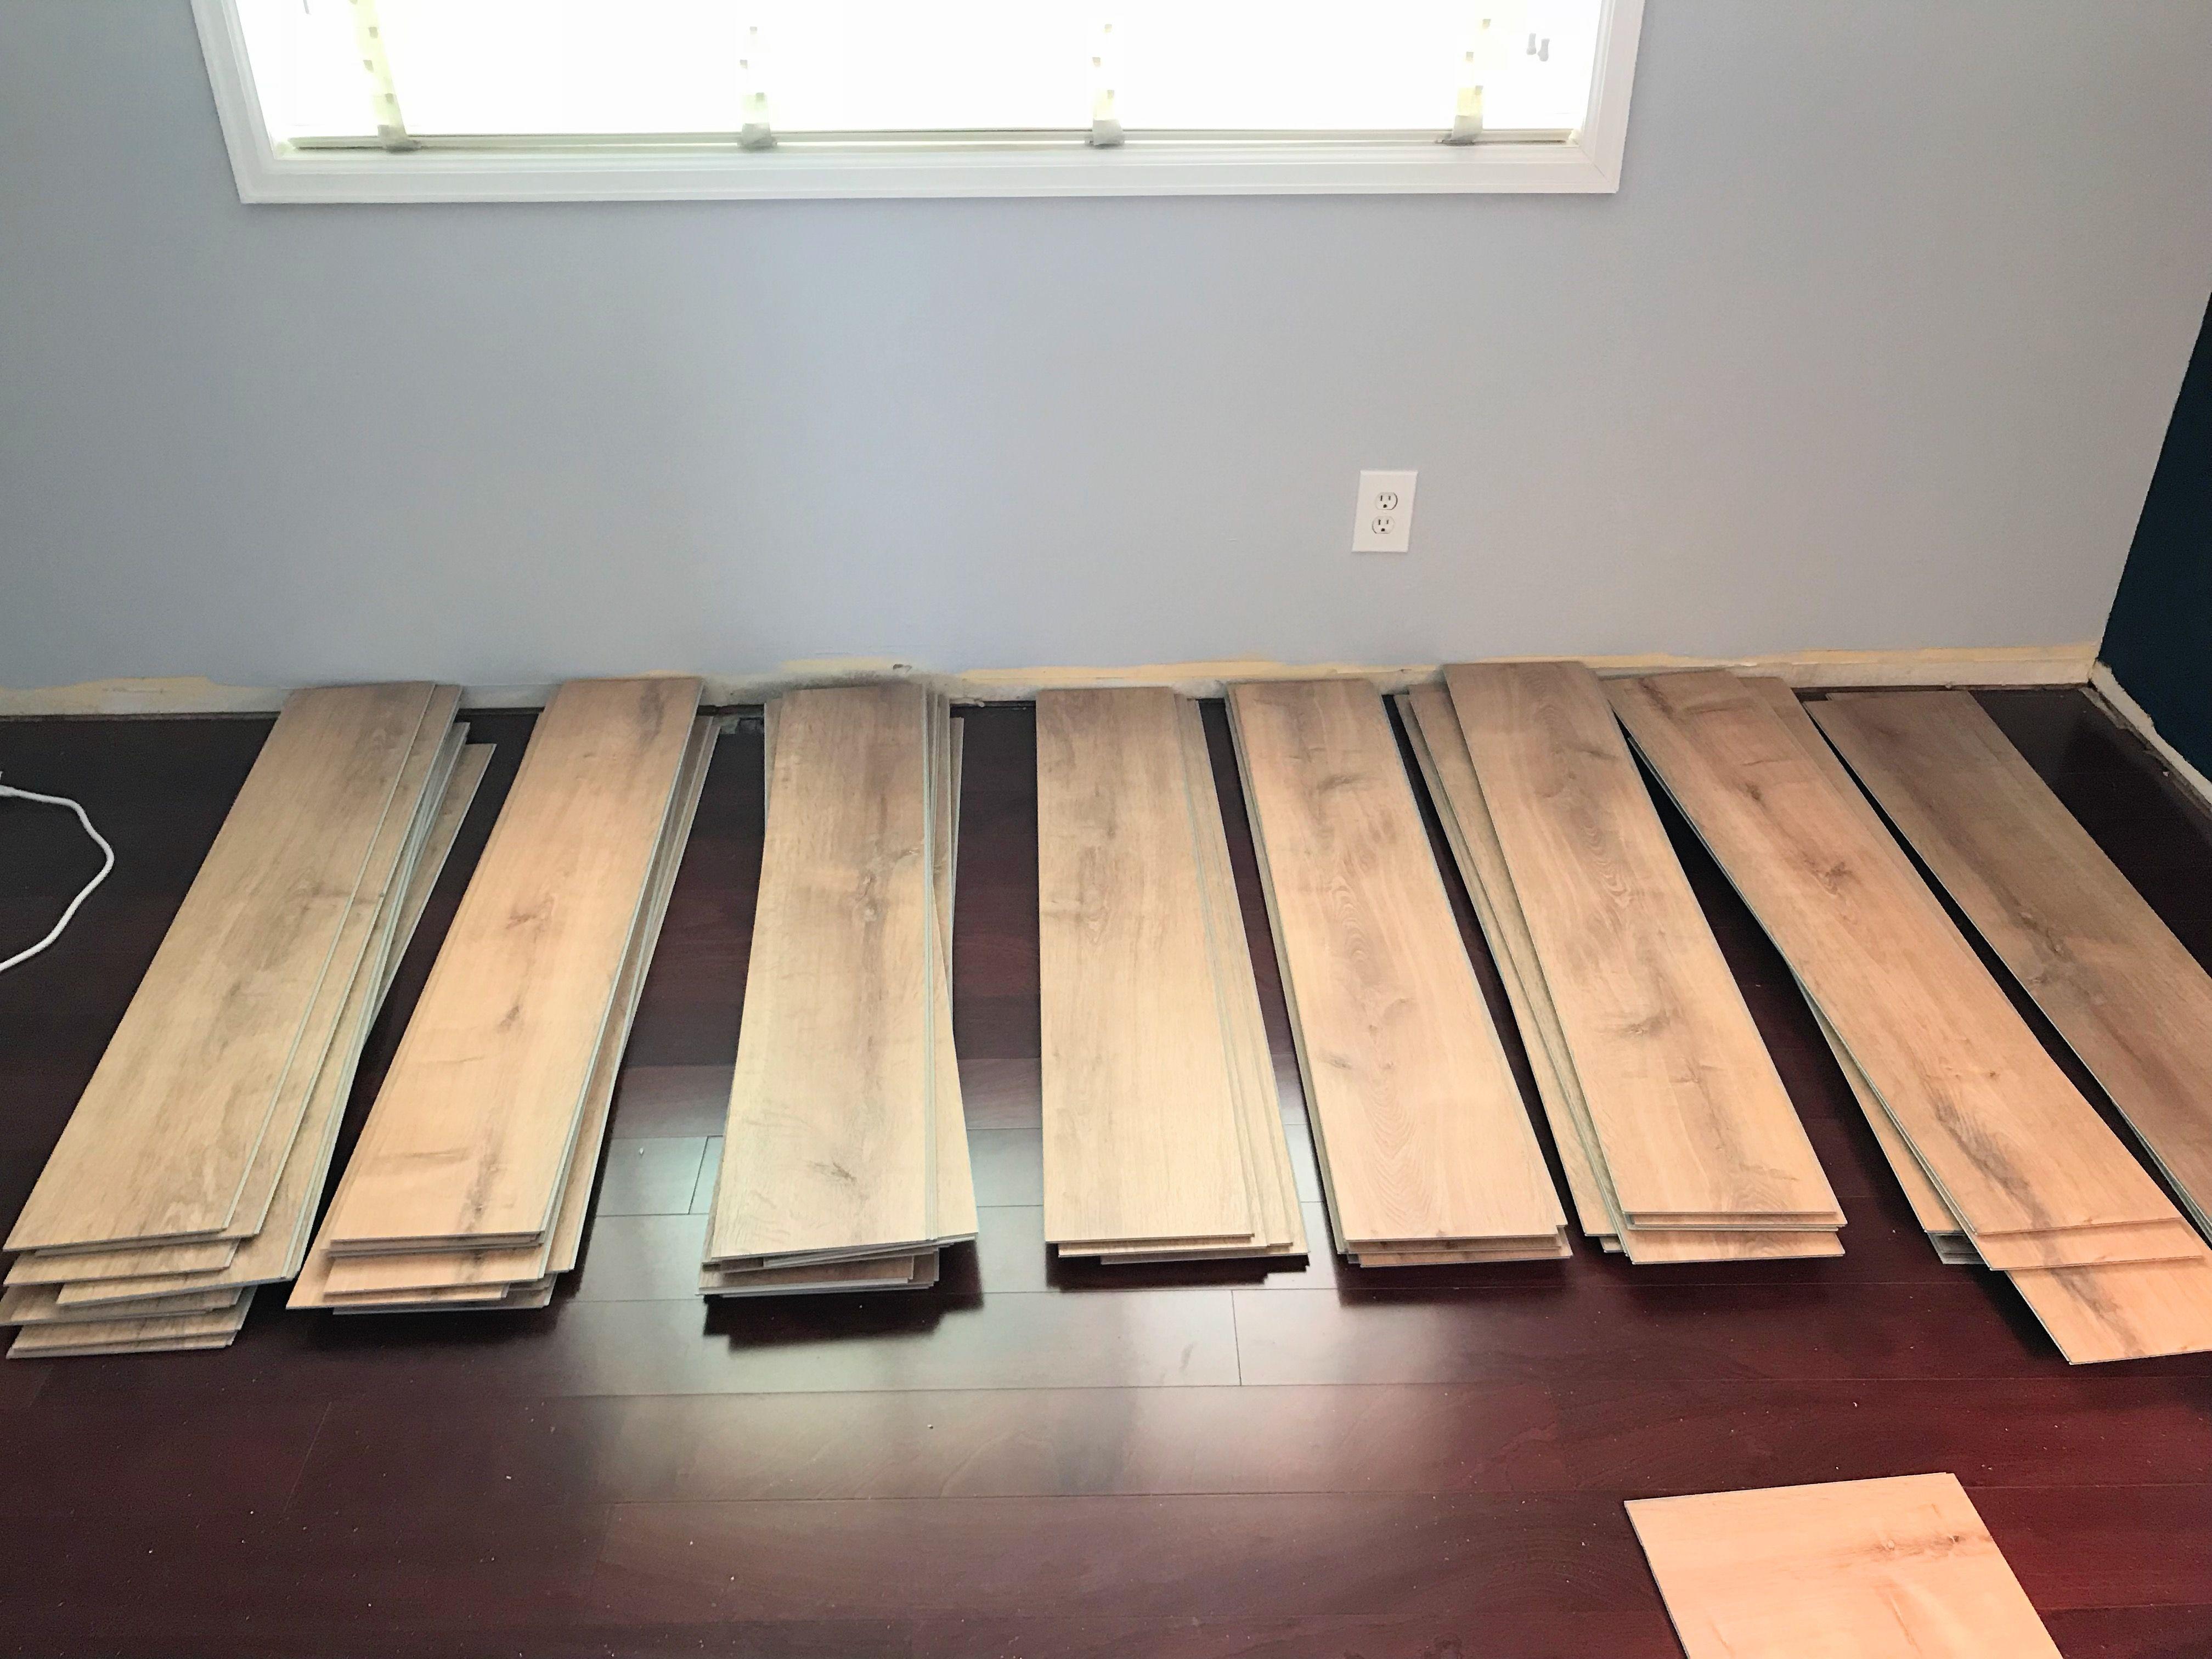 Lifeproof Fresh Oak Laminate Flooring From Home Depot Vinyl Plank Flooring Oak Laminate